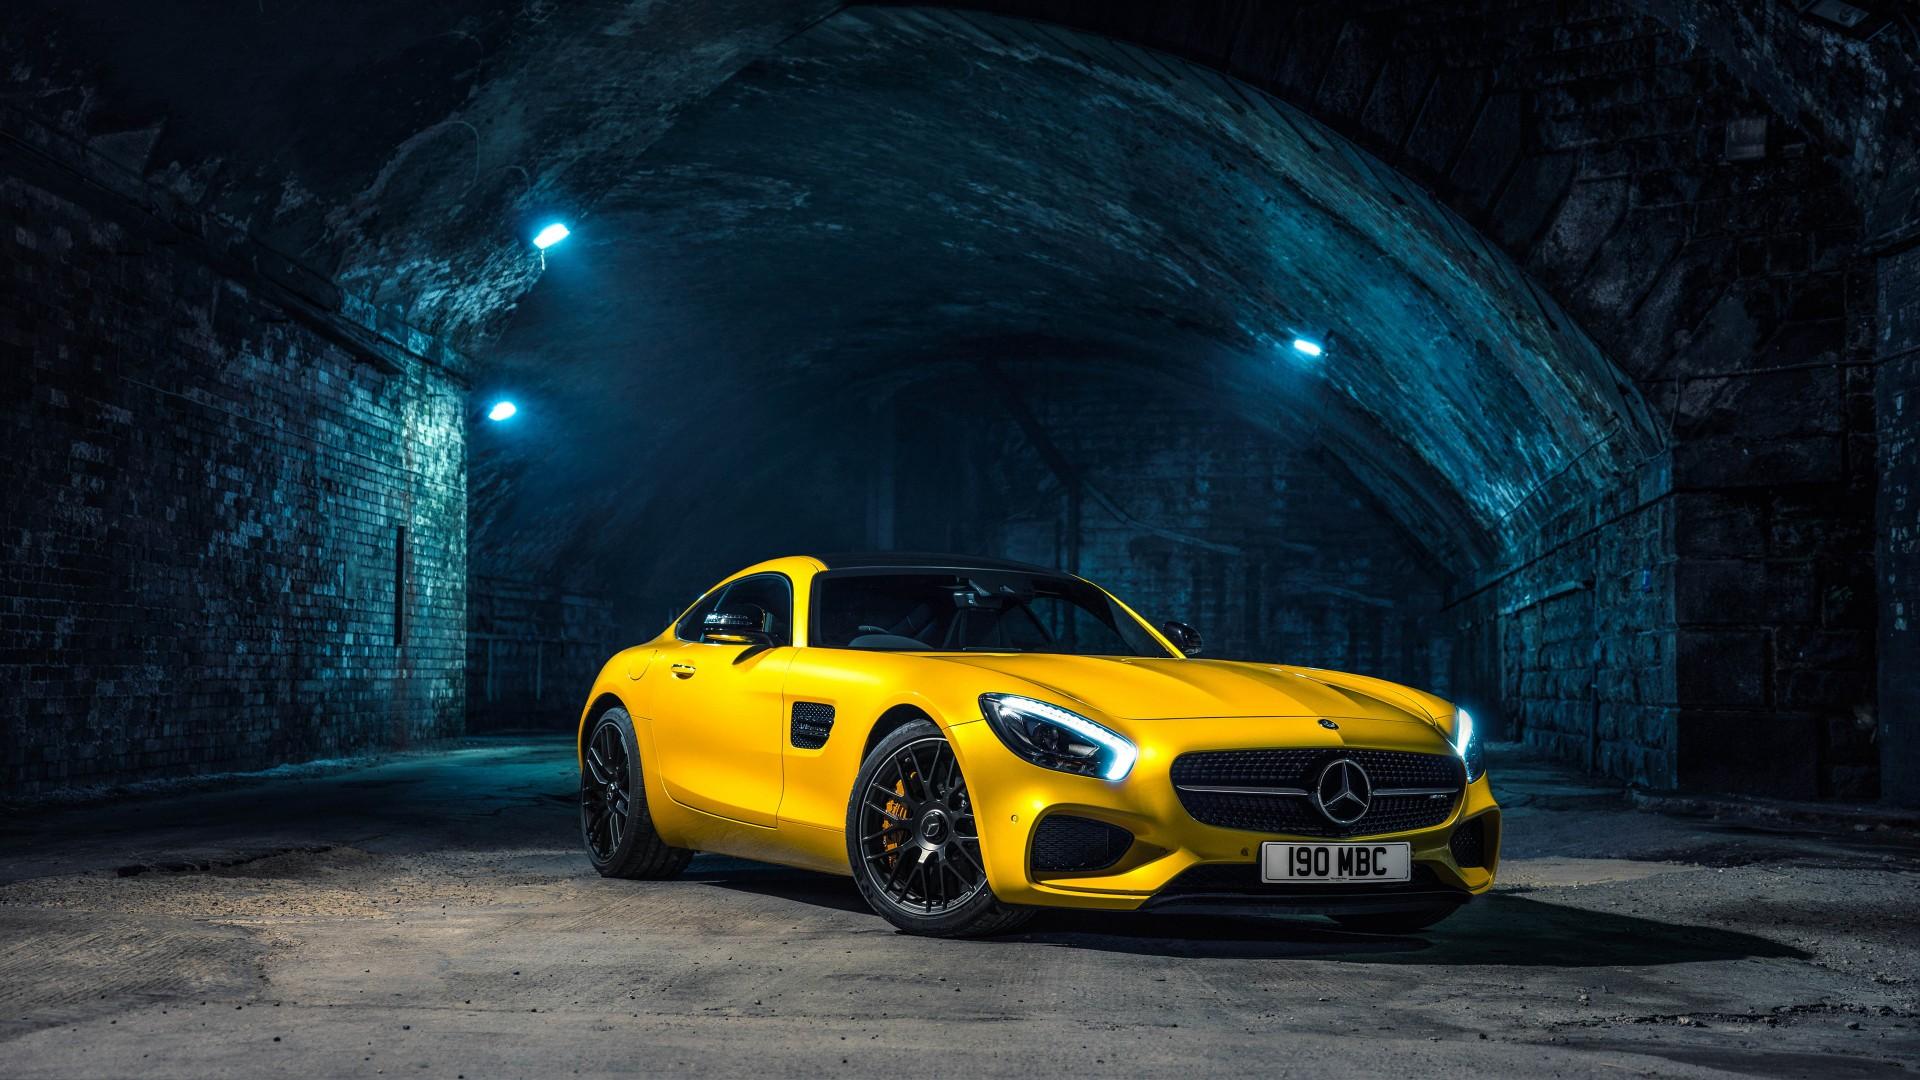 2015 Mercedes Amg Gt S Wallpaper Hd Car Wallpapers Id